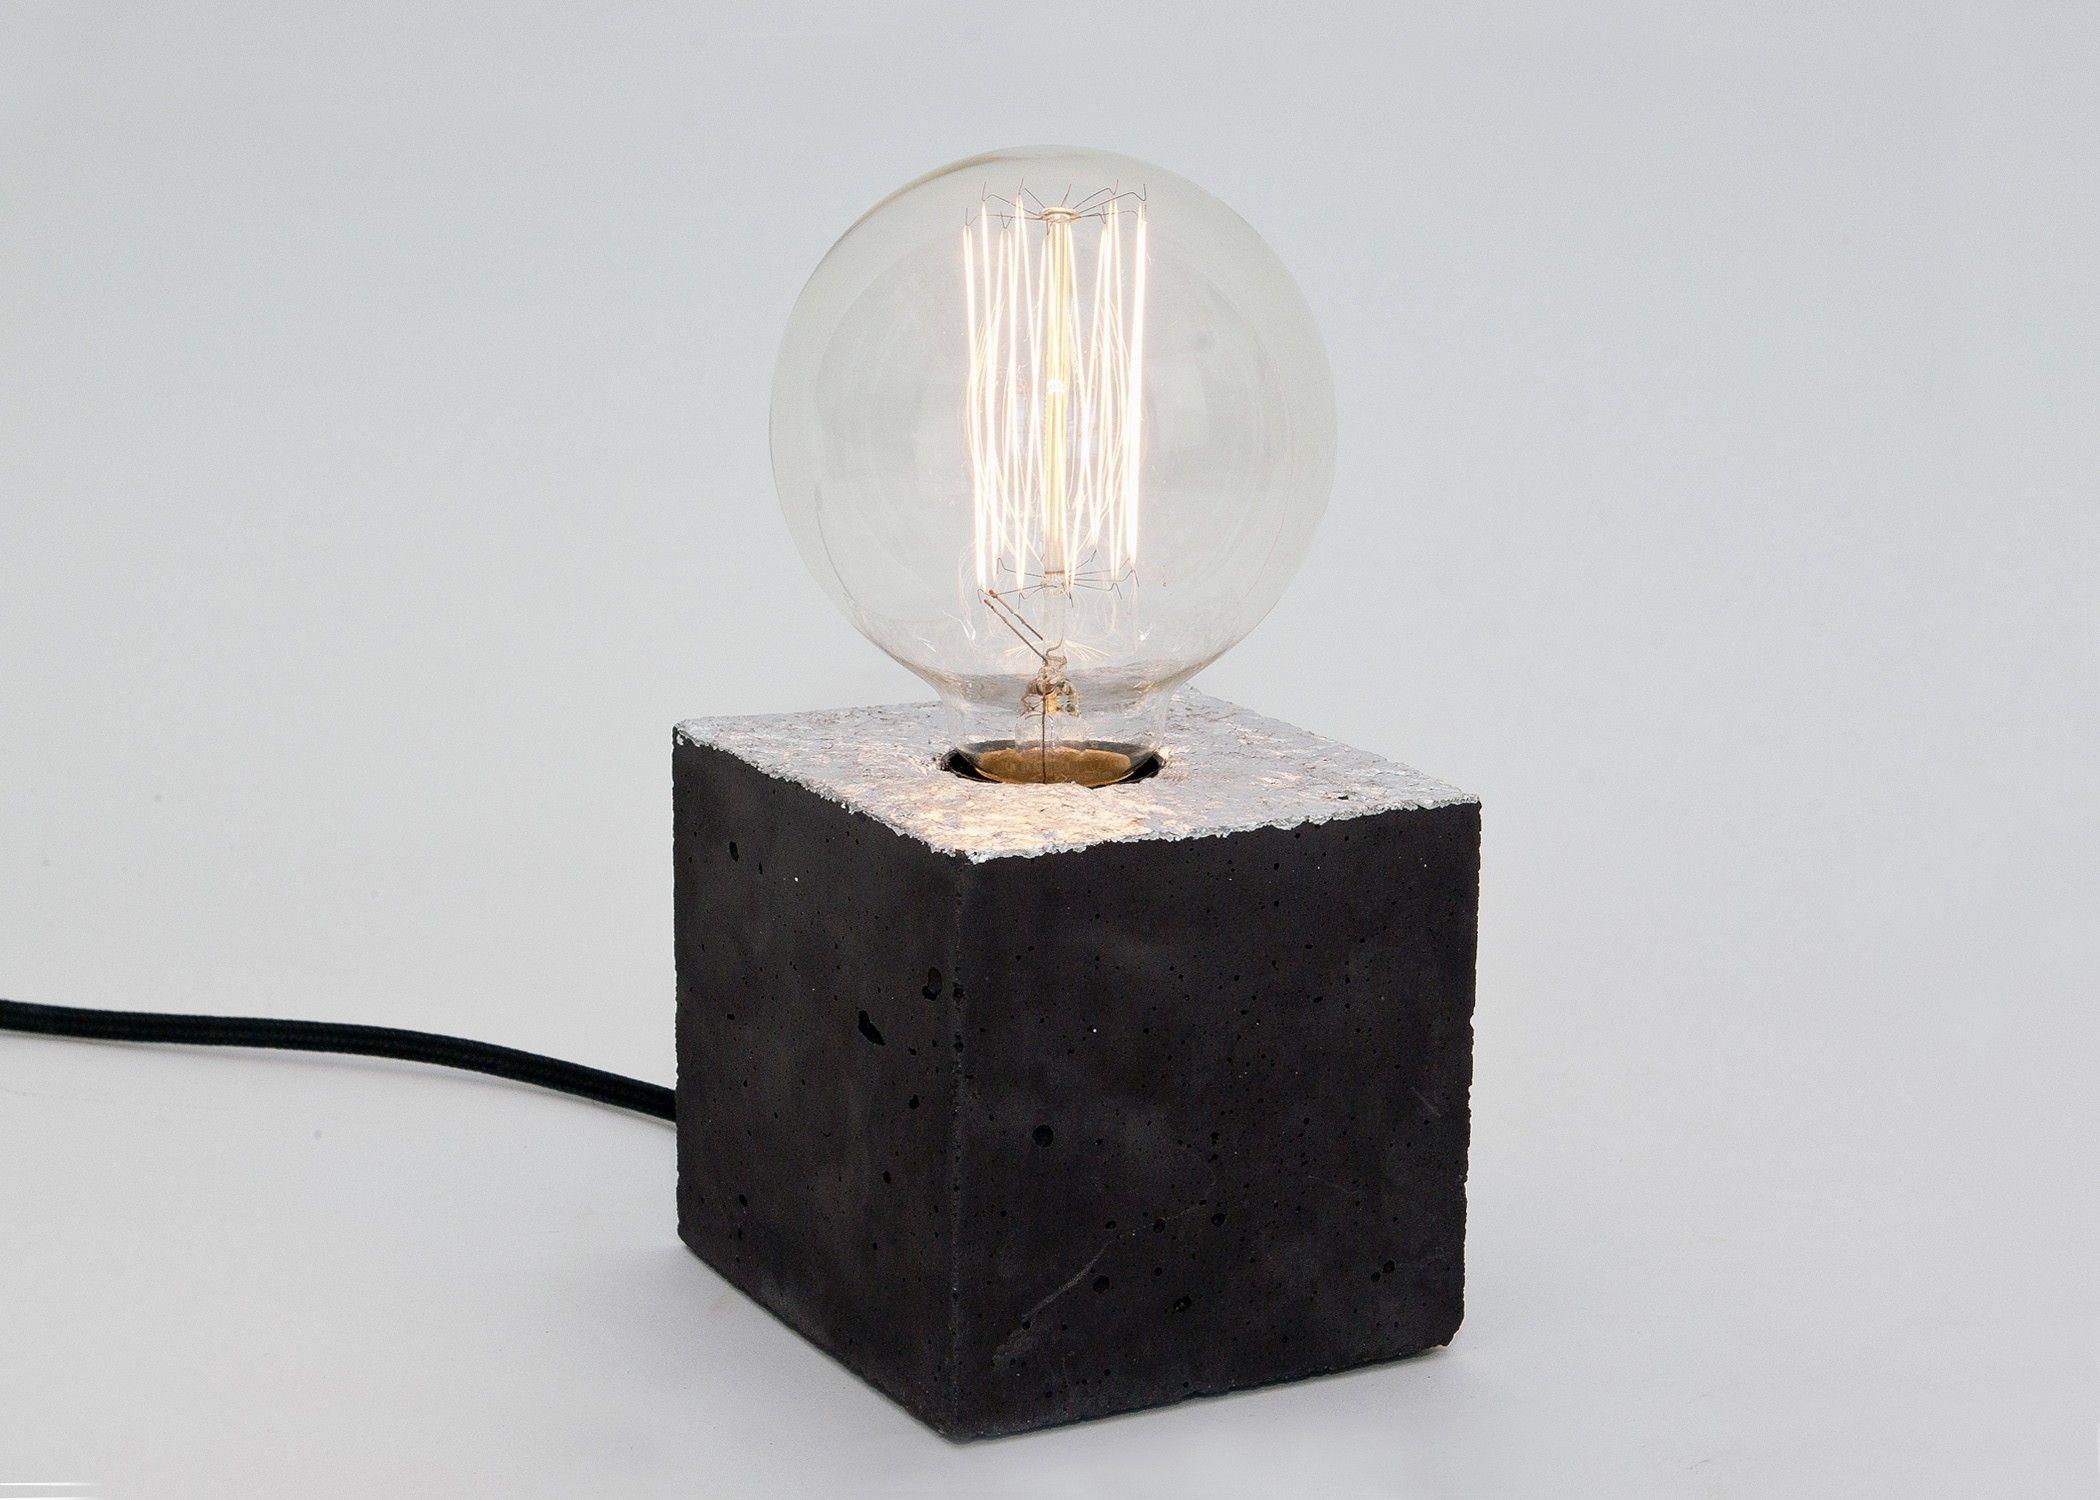 Textilkabel Le lj lamps alpha black silber tischleuchte aus schwarzem beton mit